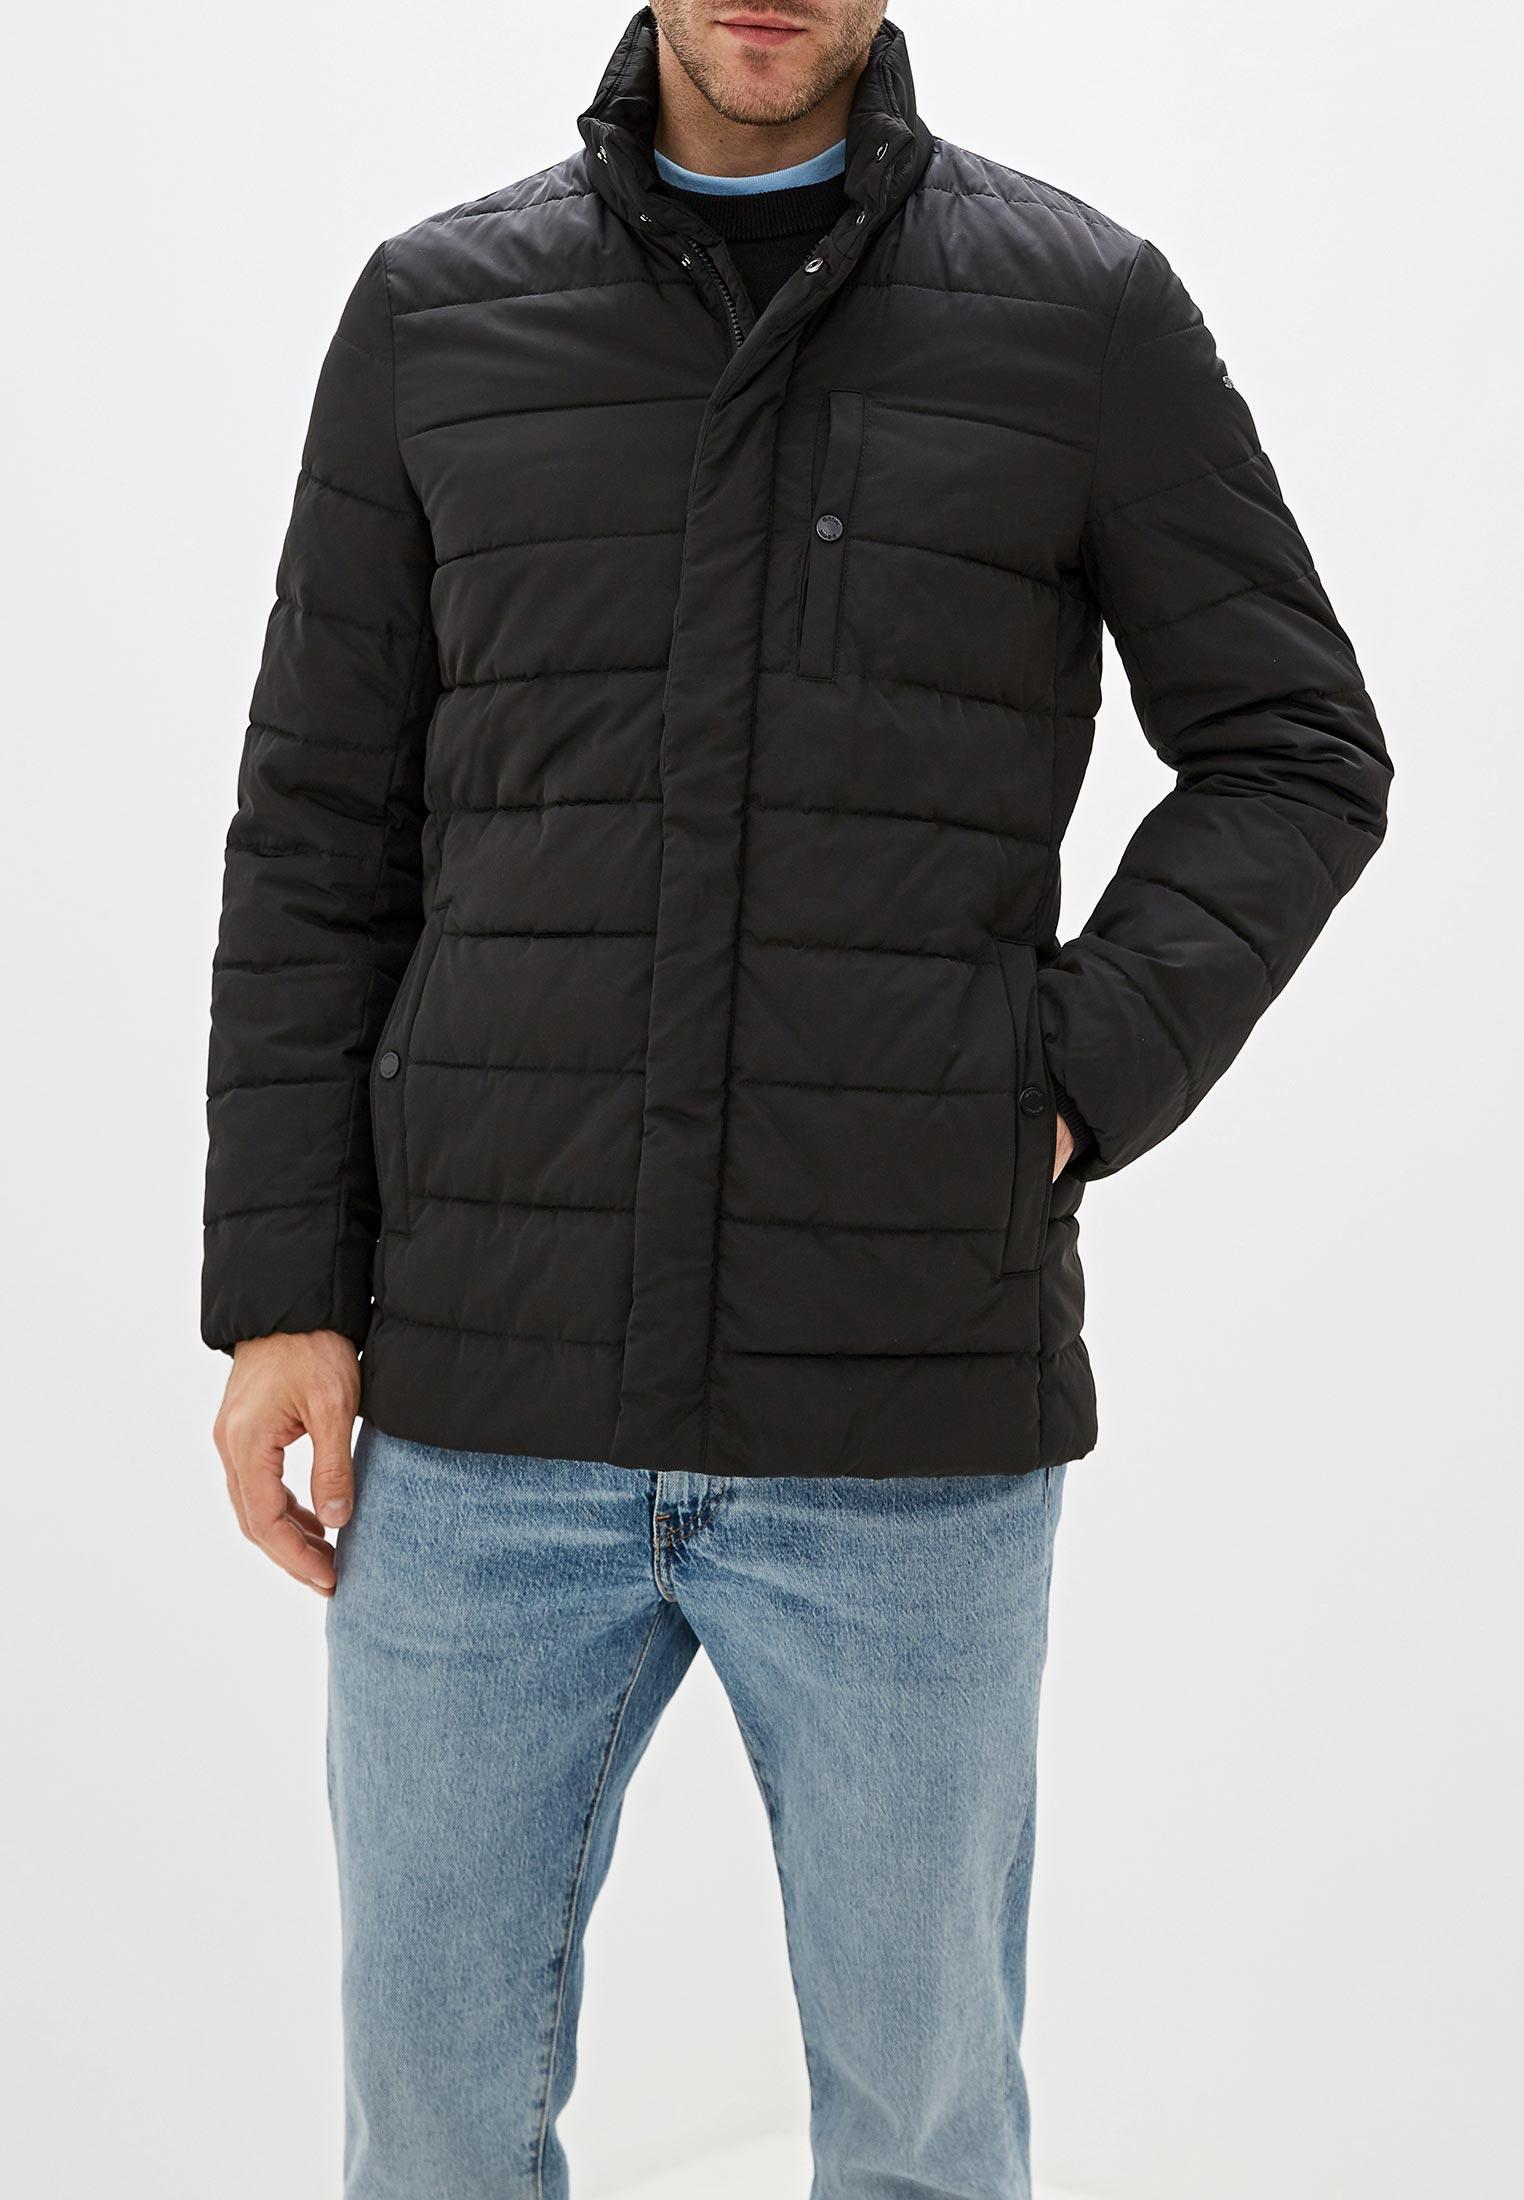 Куртка утепленная Geox купить за 327.25 р. в интернет-магазине Lamoda.by